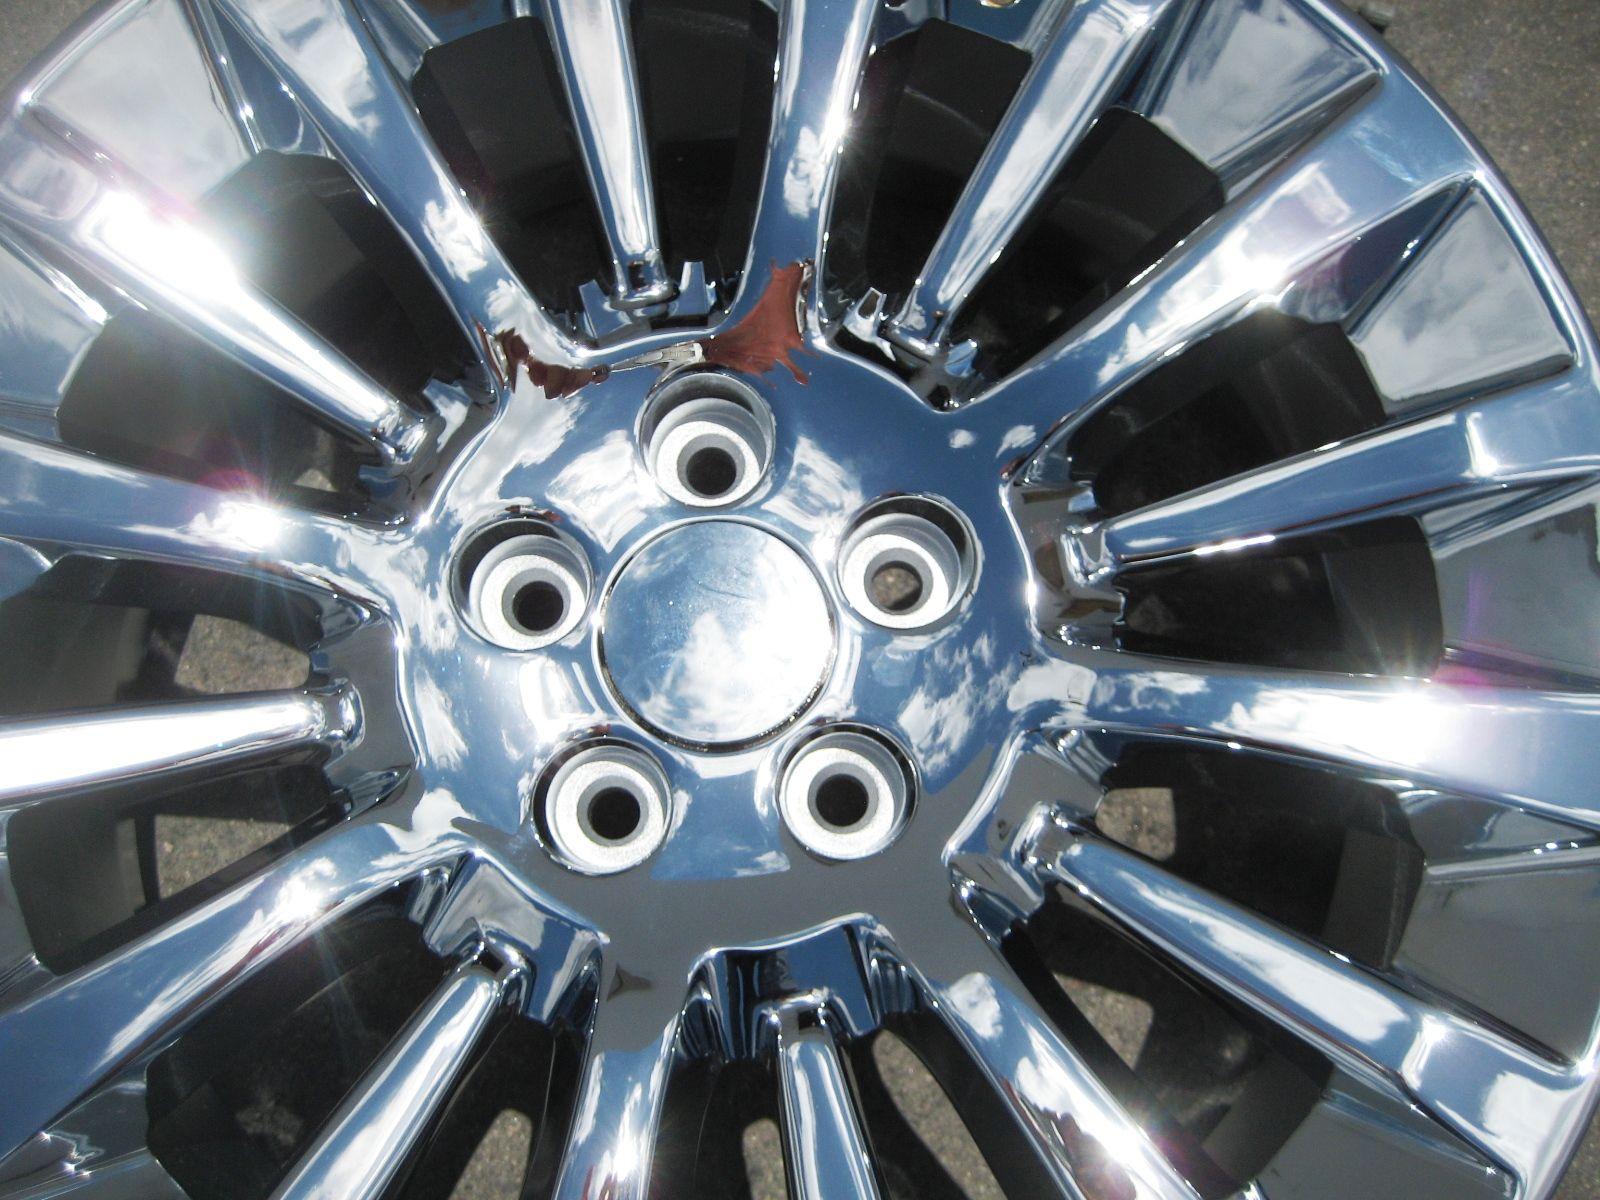 Factory Lincoln MKT Chrome Alloy Wheels Rims 2010 2012 Set of 4